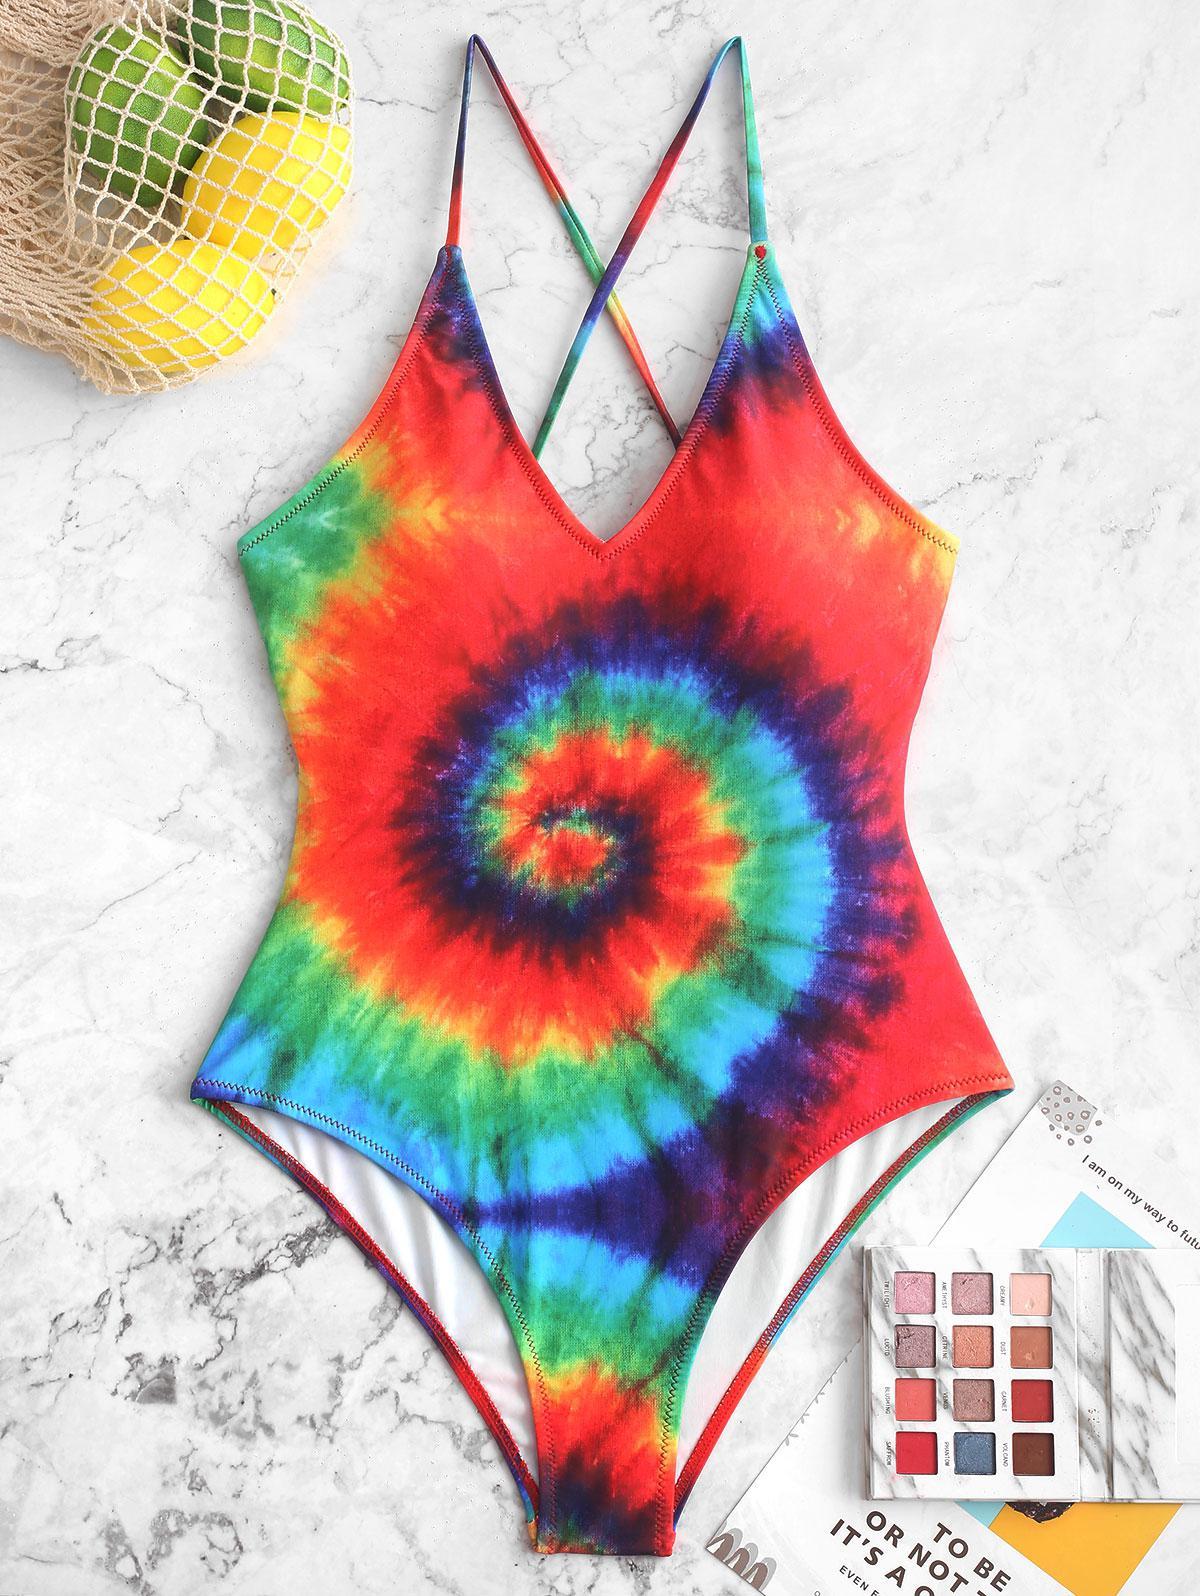 ZAFUL Rainbow Spiral Tie Dye Print One-piece Swimsuit thumbnail